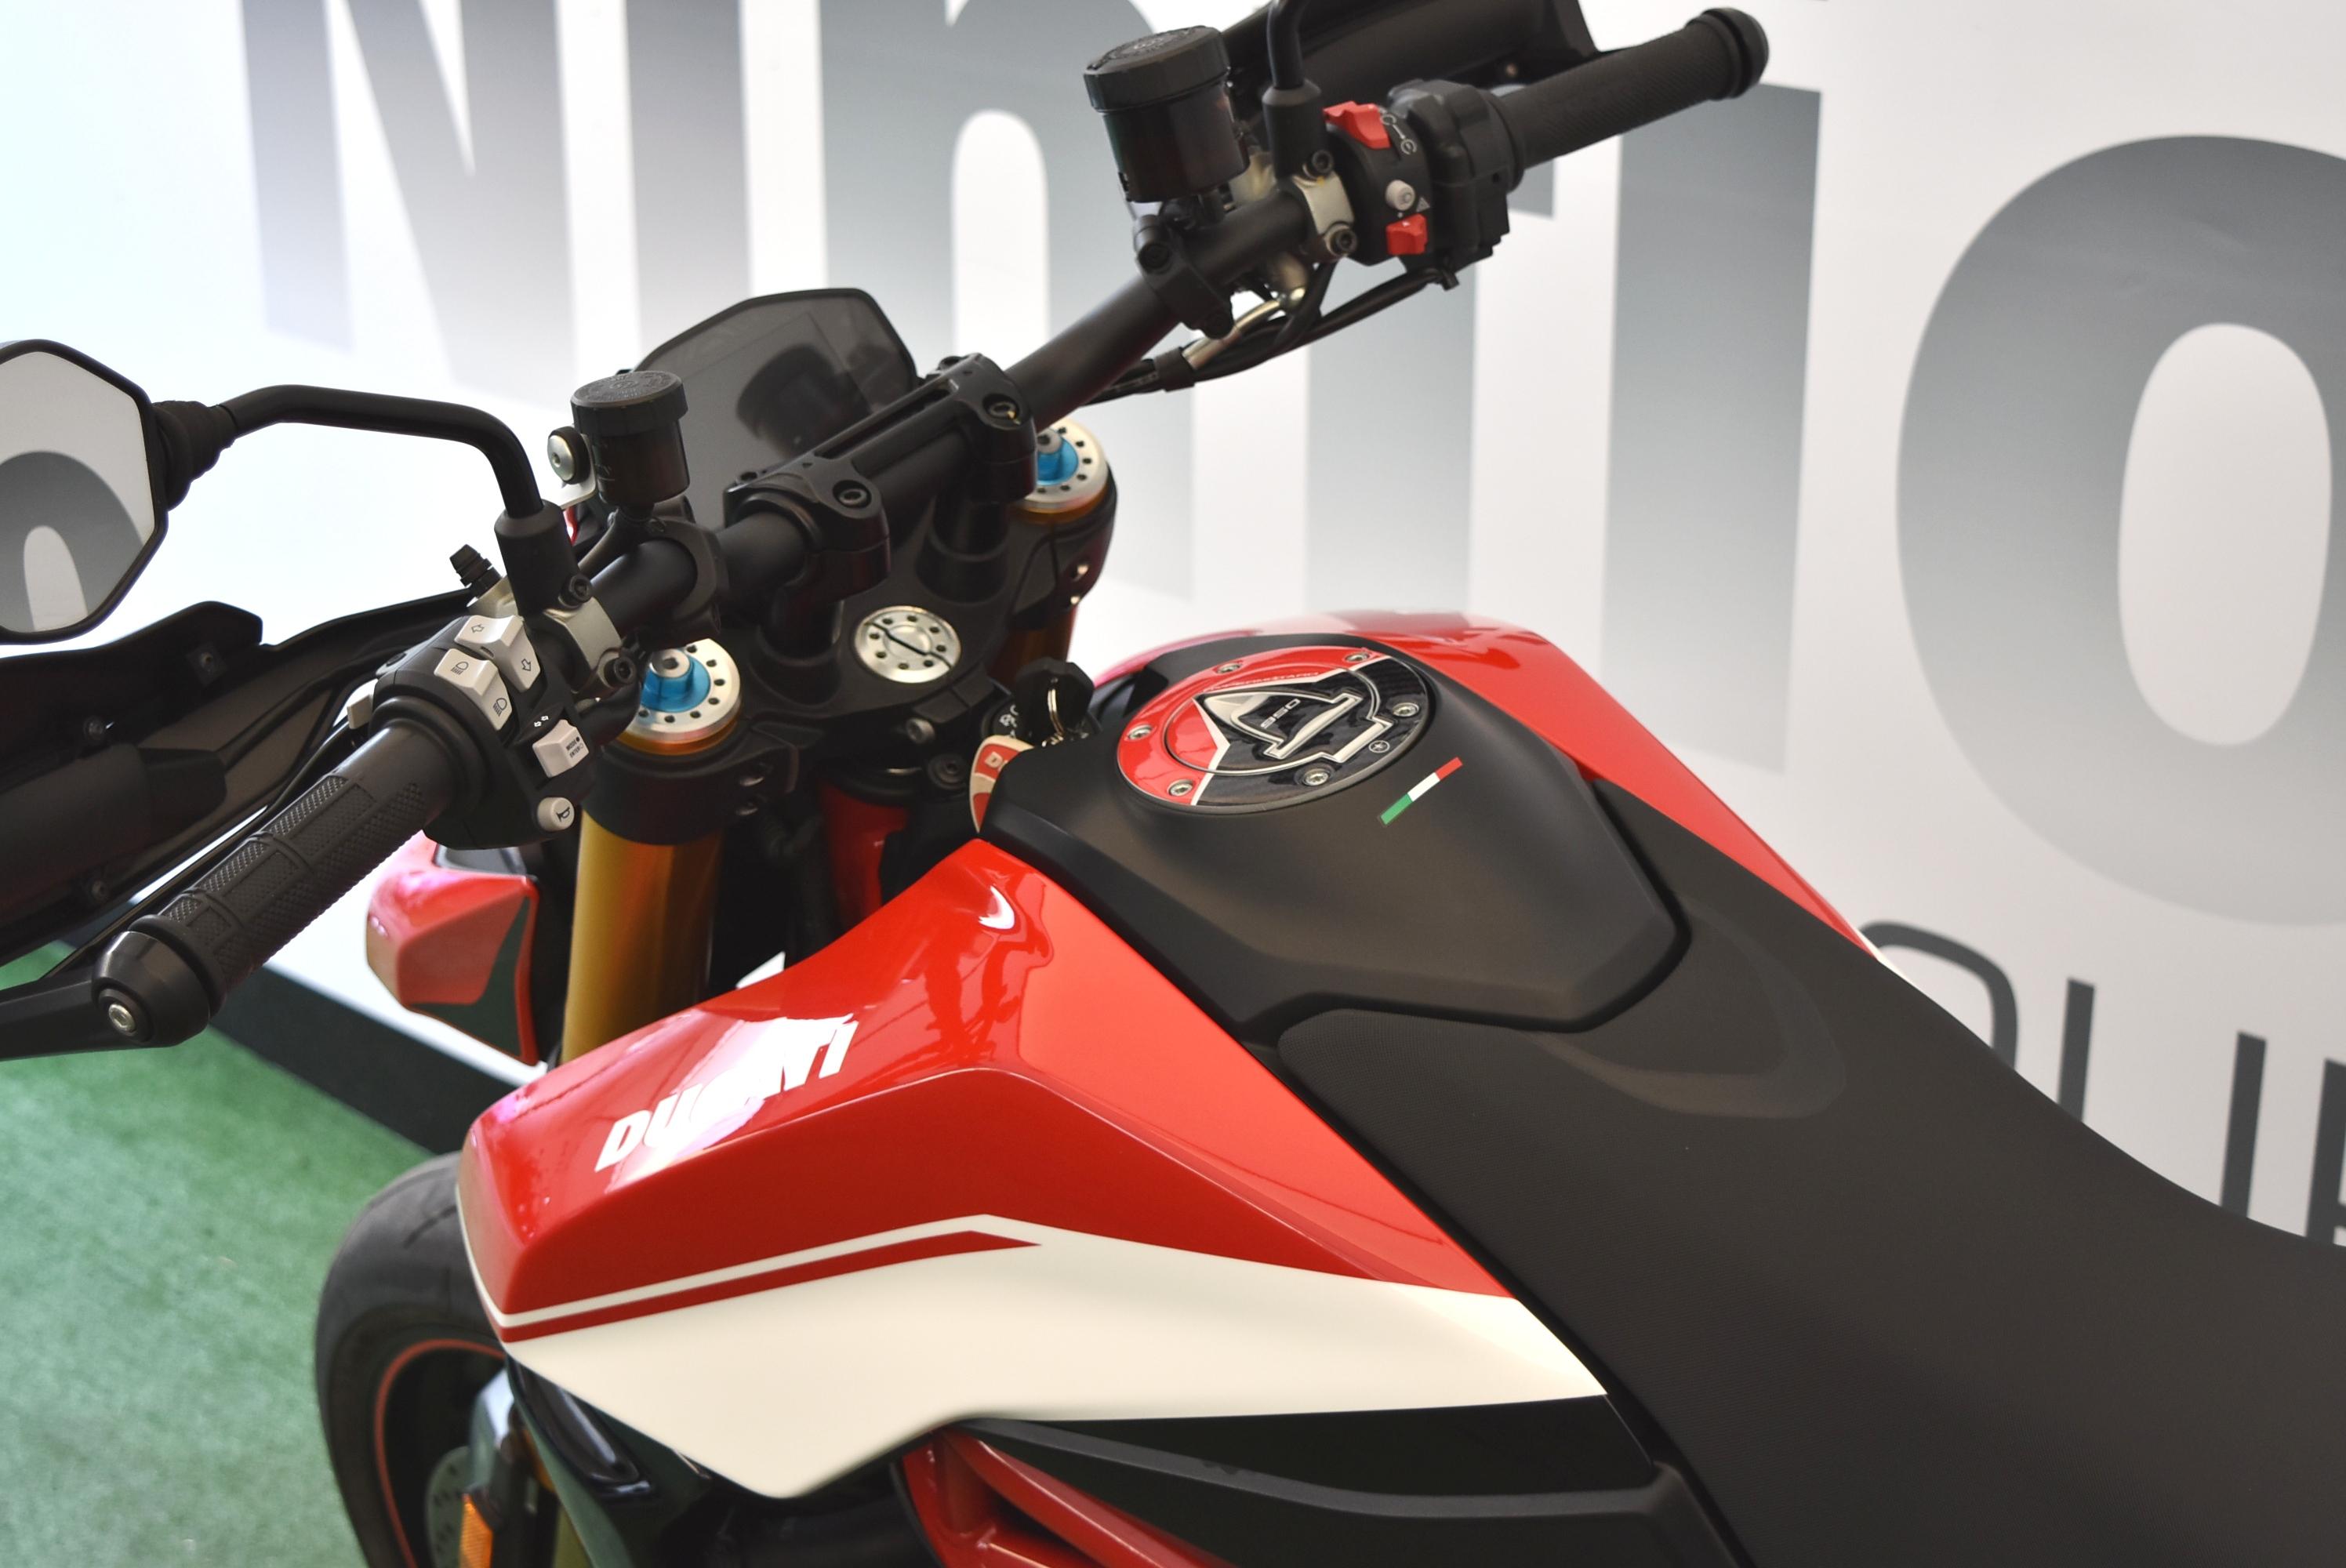 DUCATI HYPERMOTARD 950 SP – 2019